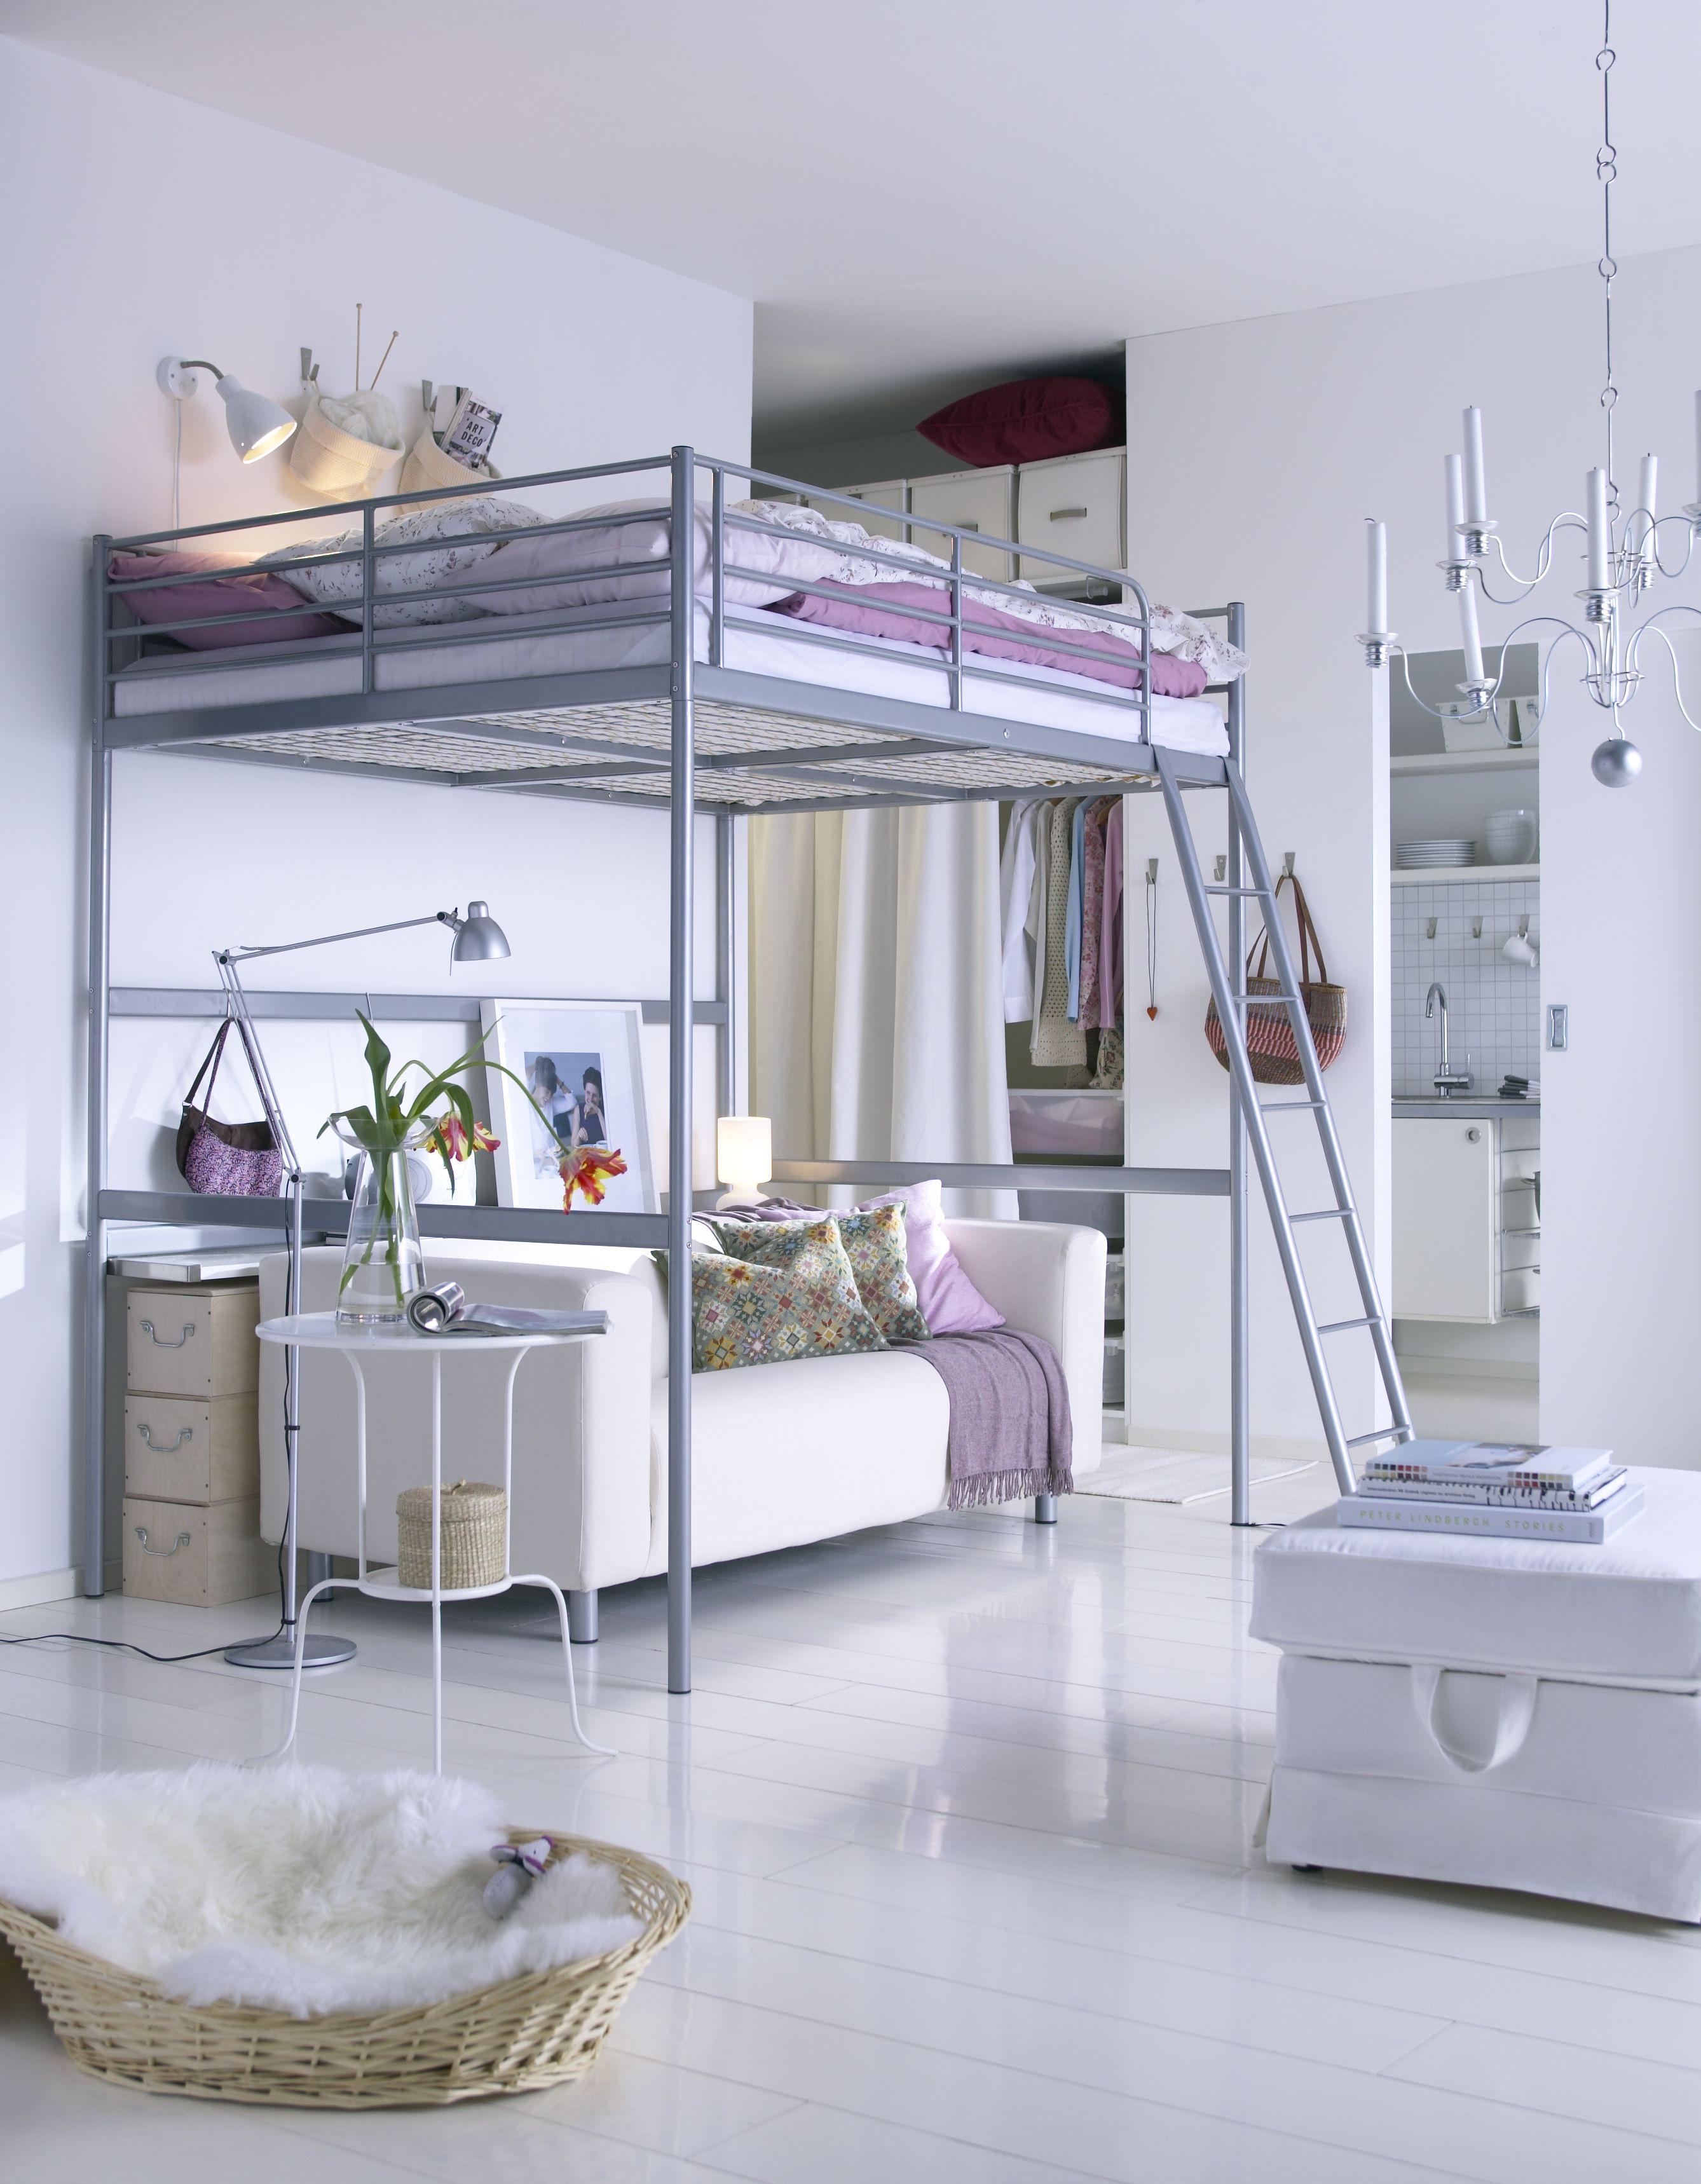 klippan 2-zitsbank, granån zwart | ikea products, interiors and house, Deco ideeën